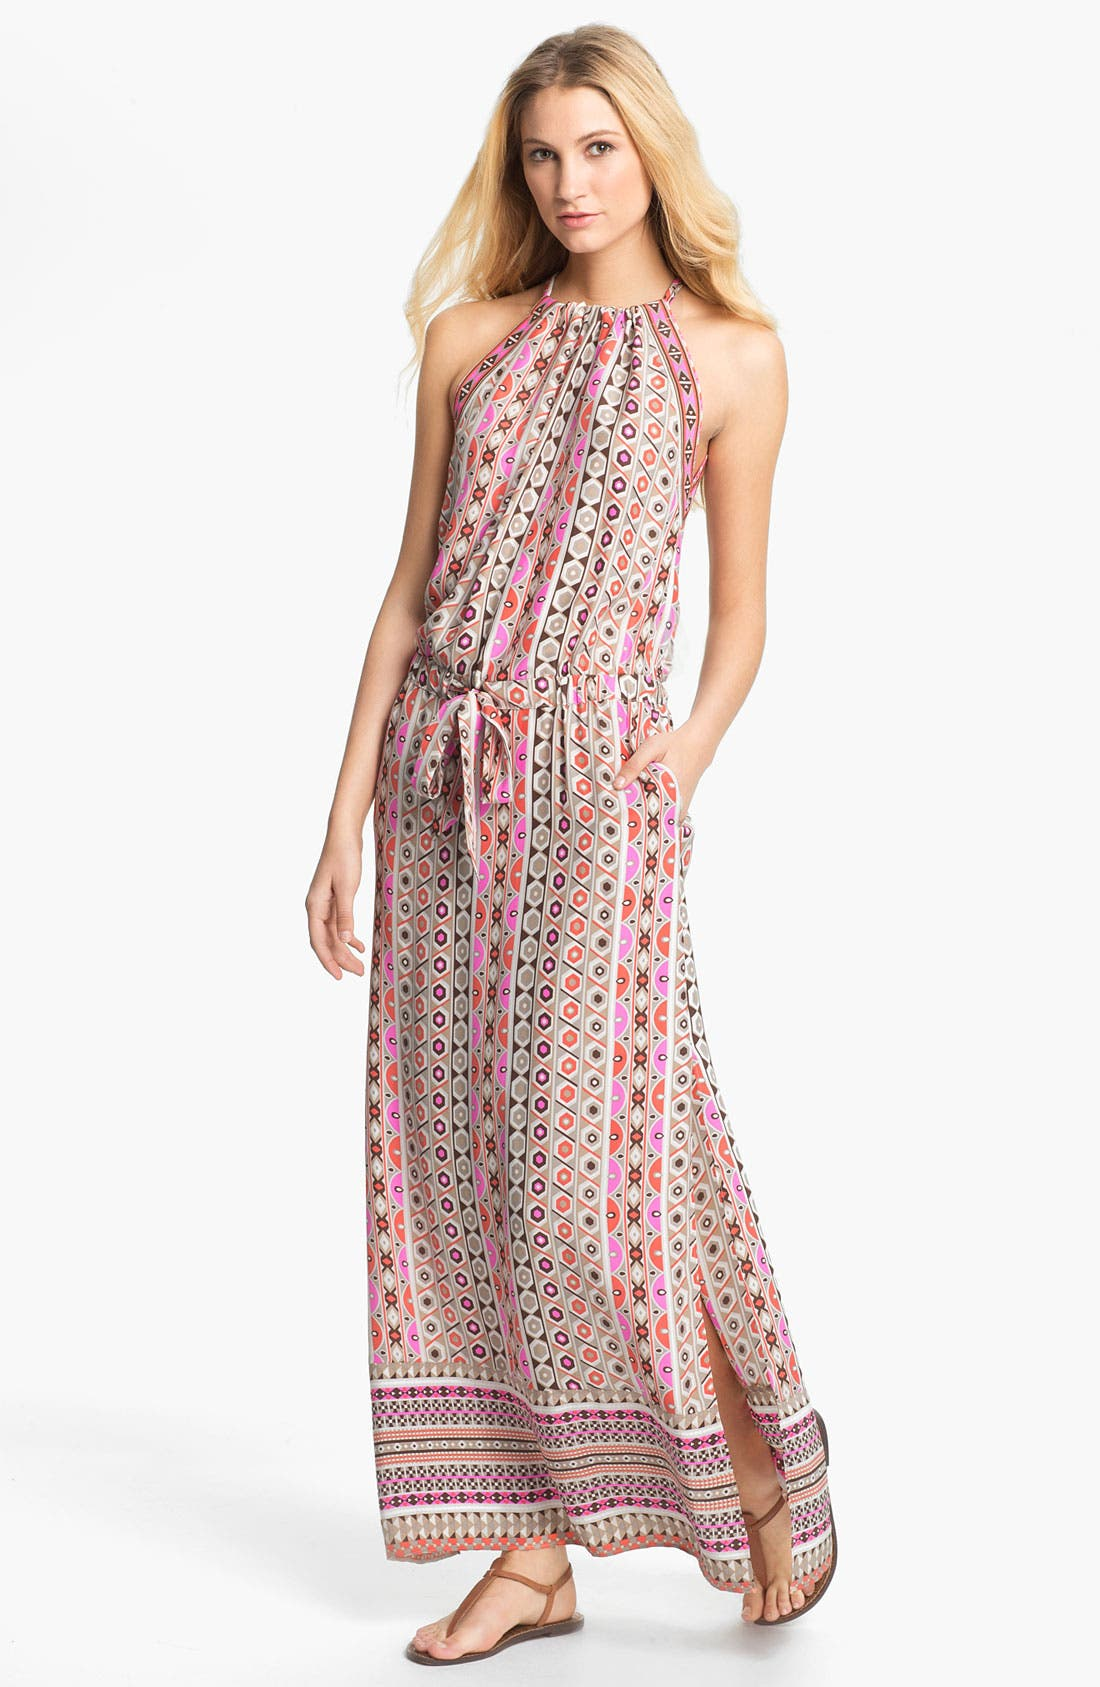 Alternate Image 1 Selected - ALICE & TRIXIE 'Jullian' Print Silk Blouson Maxi Dress